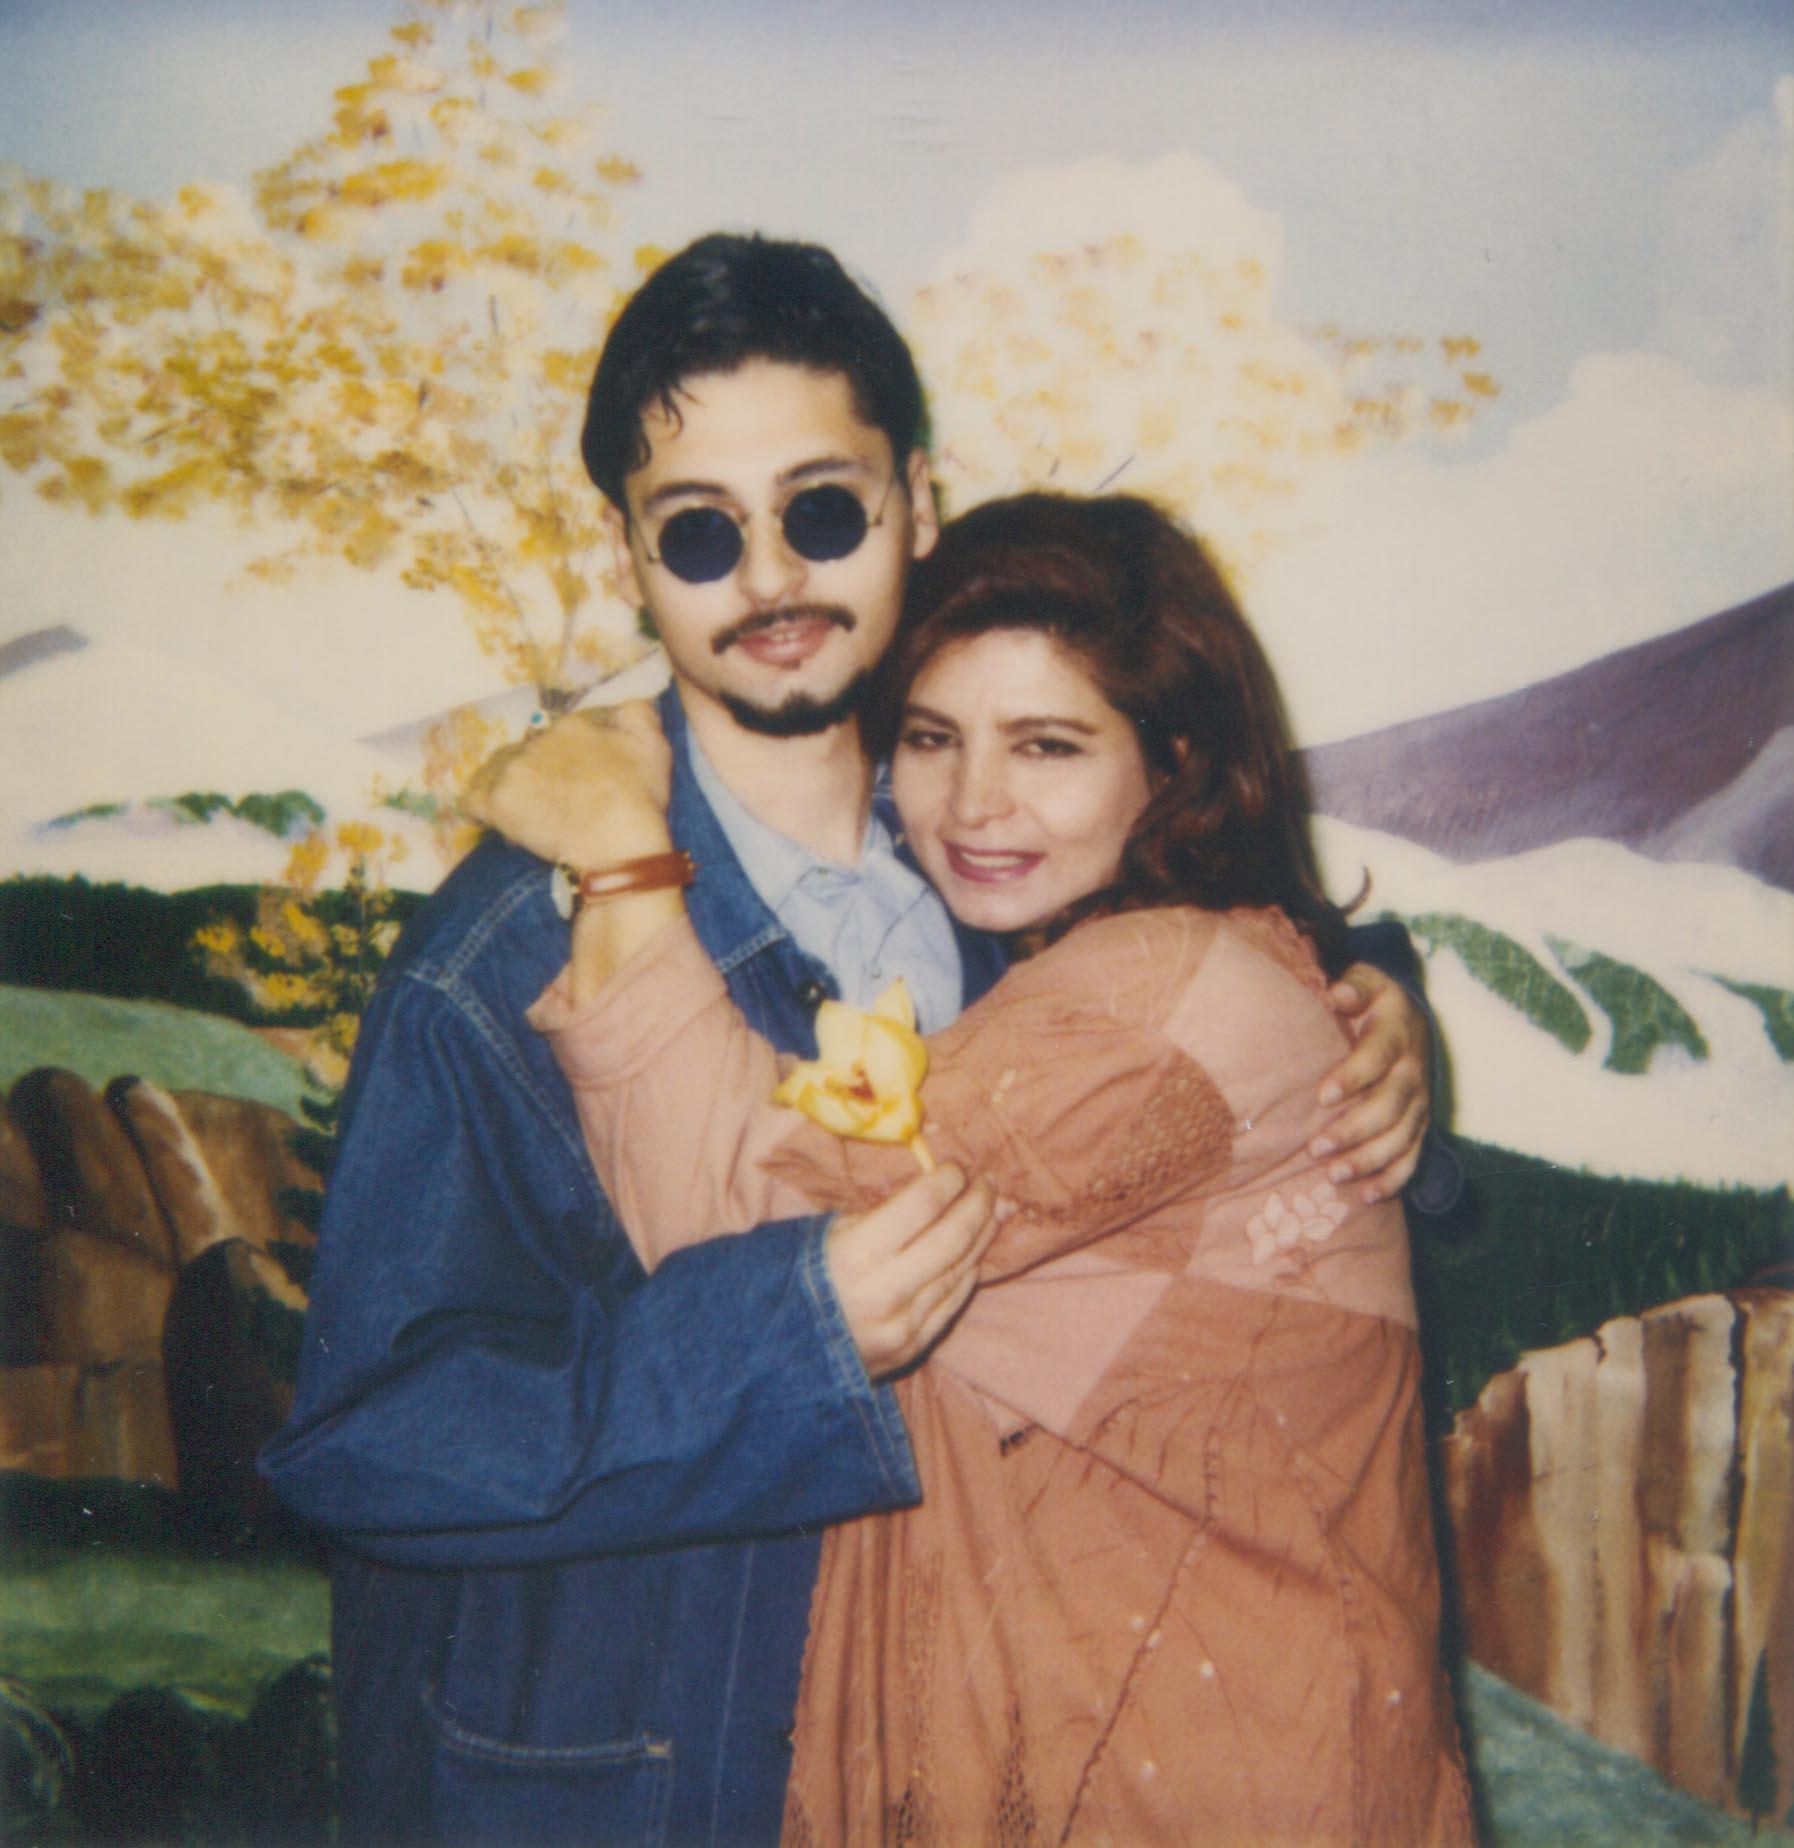 saturday Jan 04, 1997 - شنبه ١۵ دی ١۳۷۵ پس از یکماه دوری از هومن عزیز بخاطر تلاش برای آزادیاش